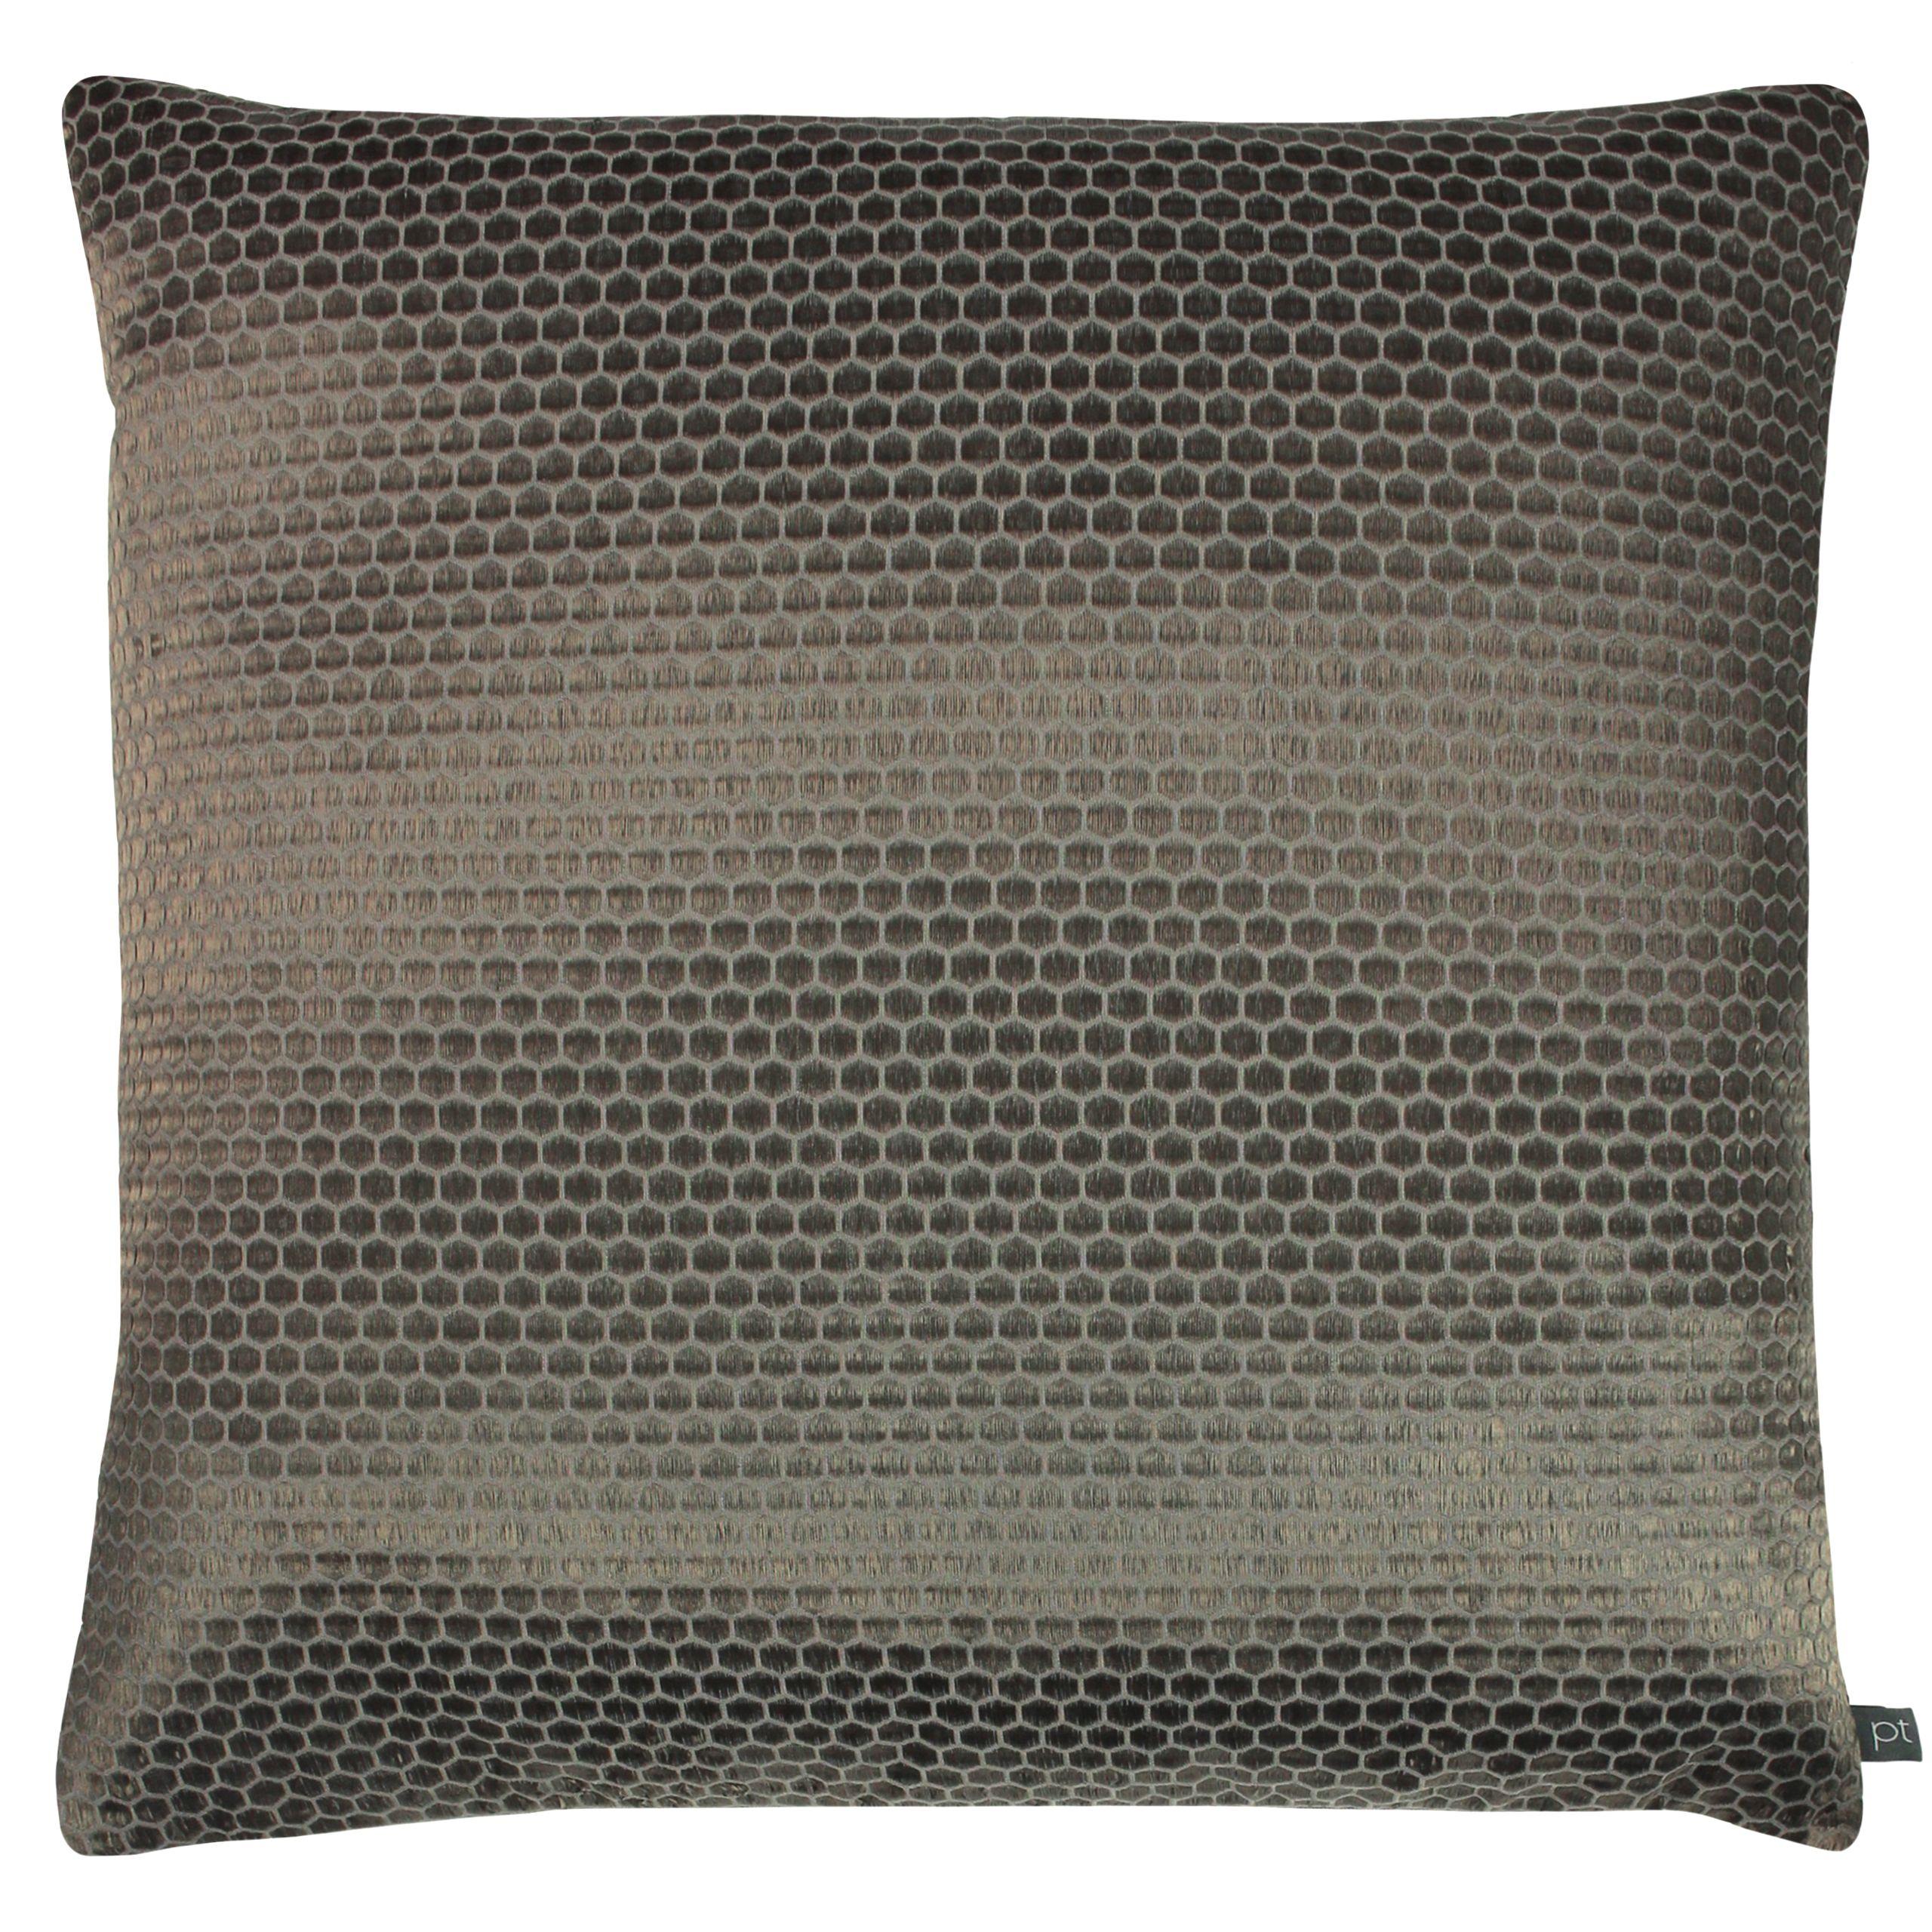 Prestigious Textiles Emboss Polyester Filled Cushion, Polyester, Cotton, Moleskin